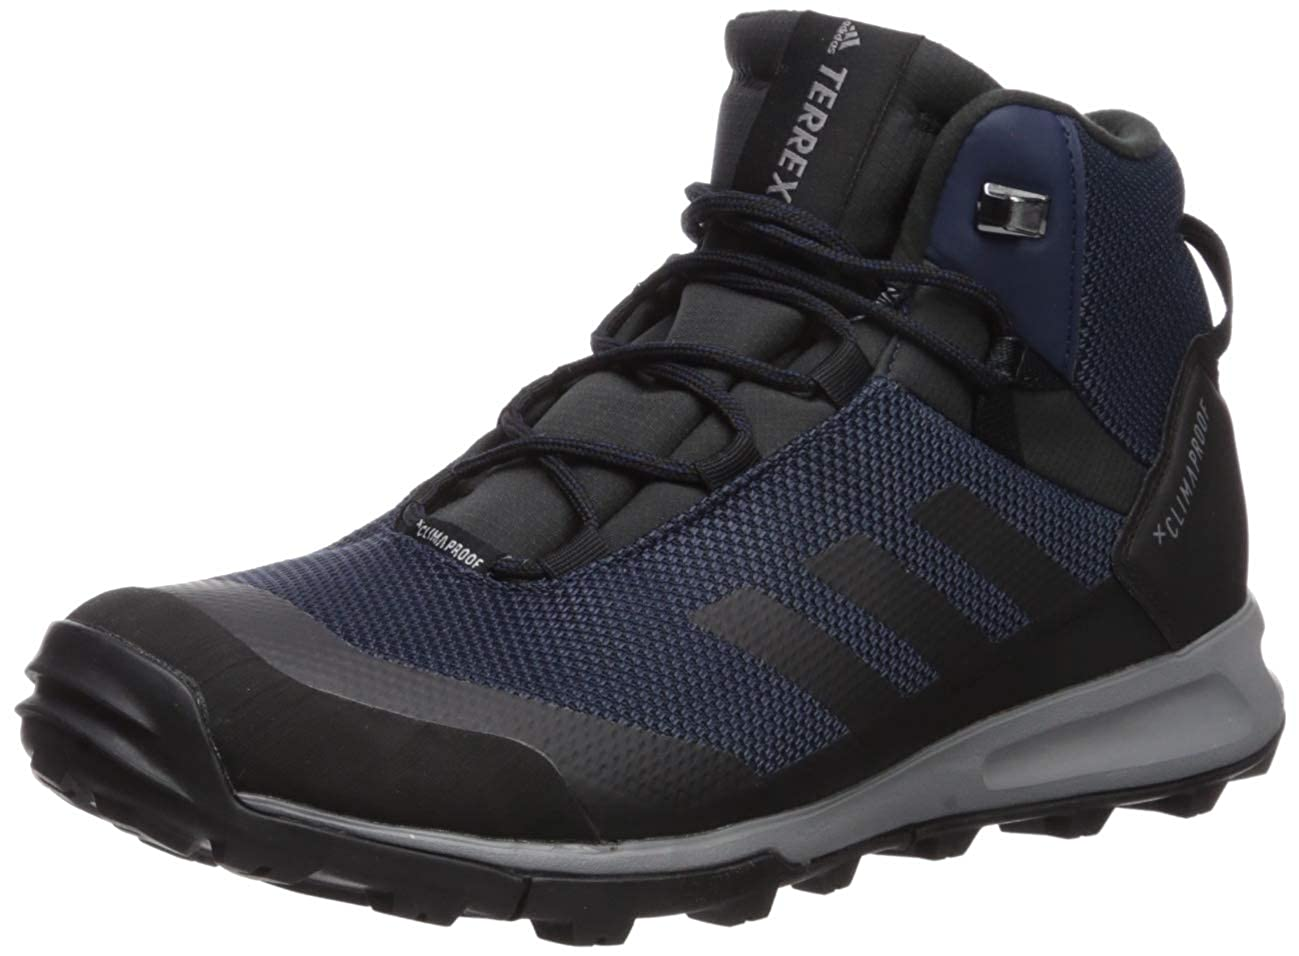 classic styles huge selection of buy cheap adidas Men's Terrex Tivid Mid Cp Walking Shoe: Amazon.co.uk ...